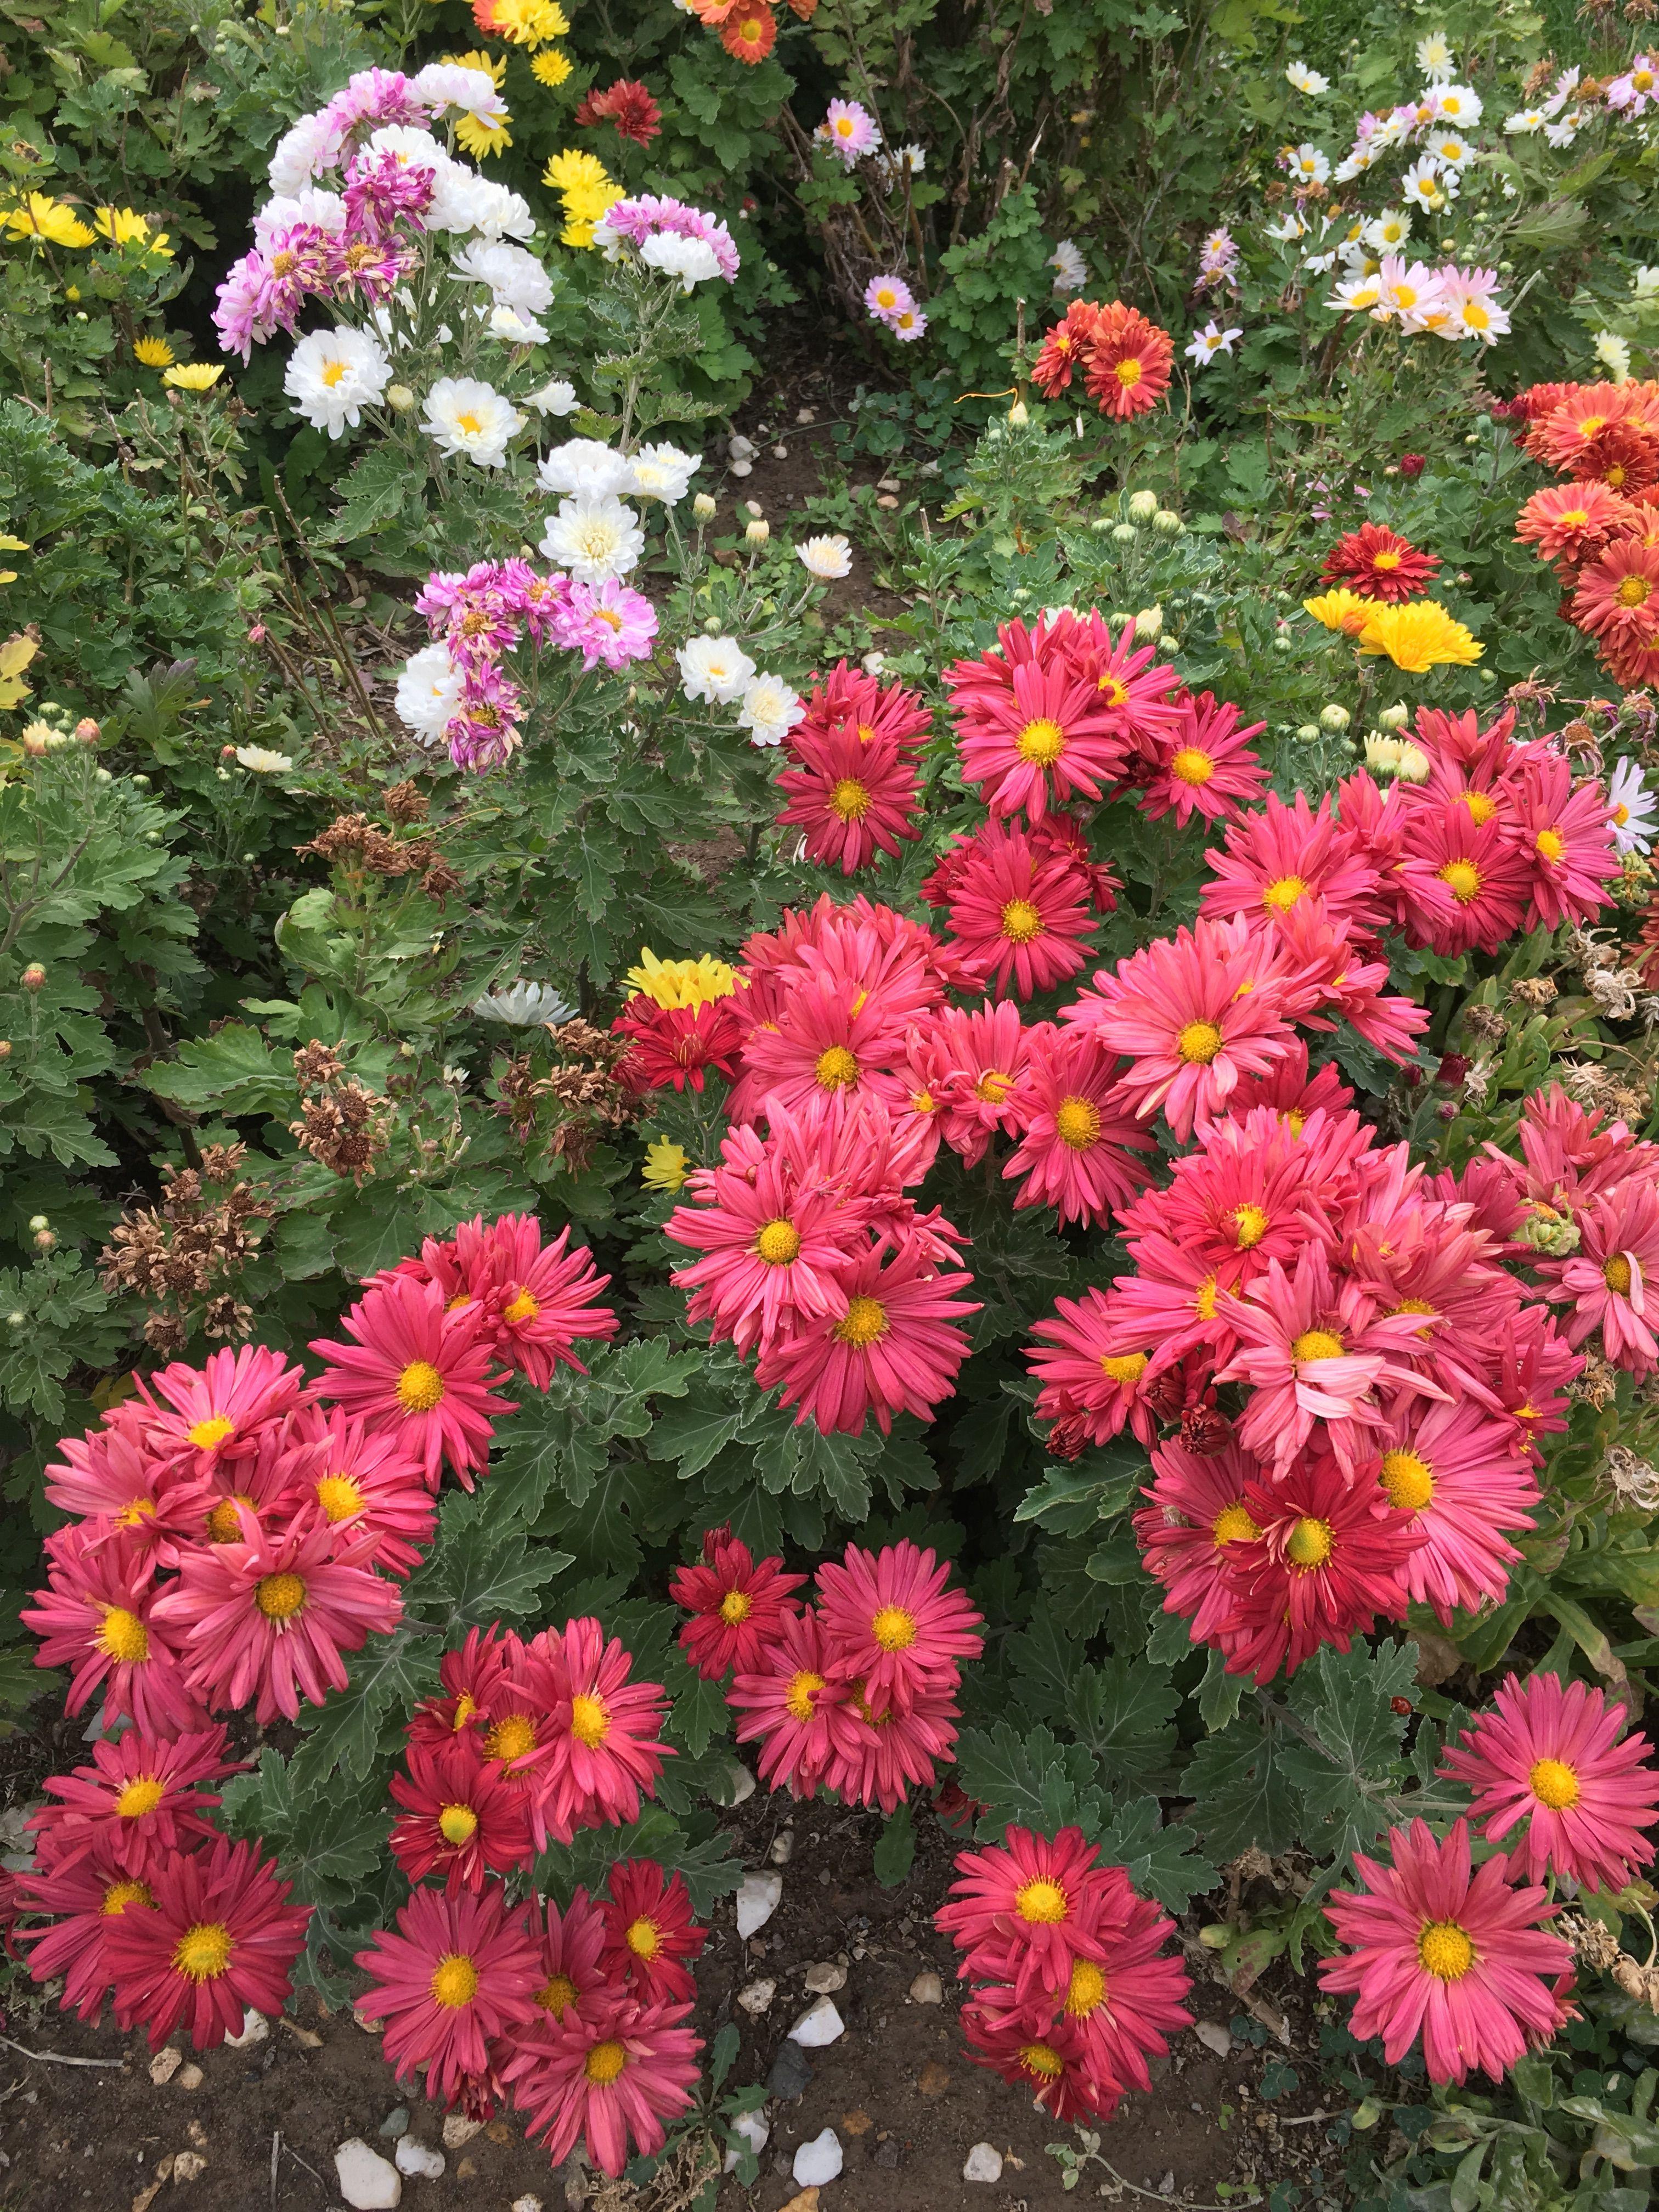 Alyson Eckmann Nude pinzahra sadighzadeh on my flower photos   flower photos